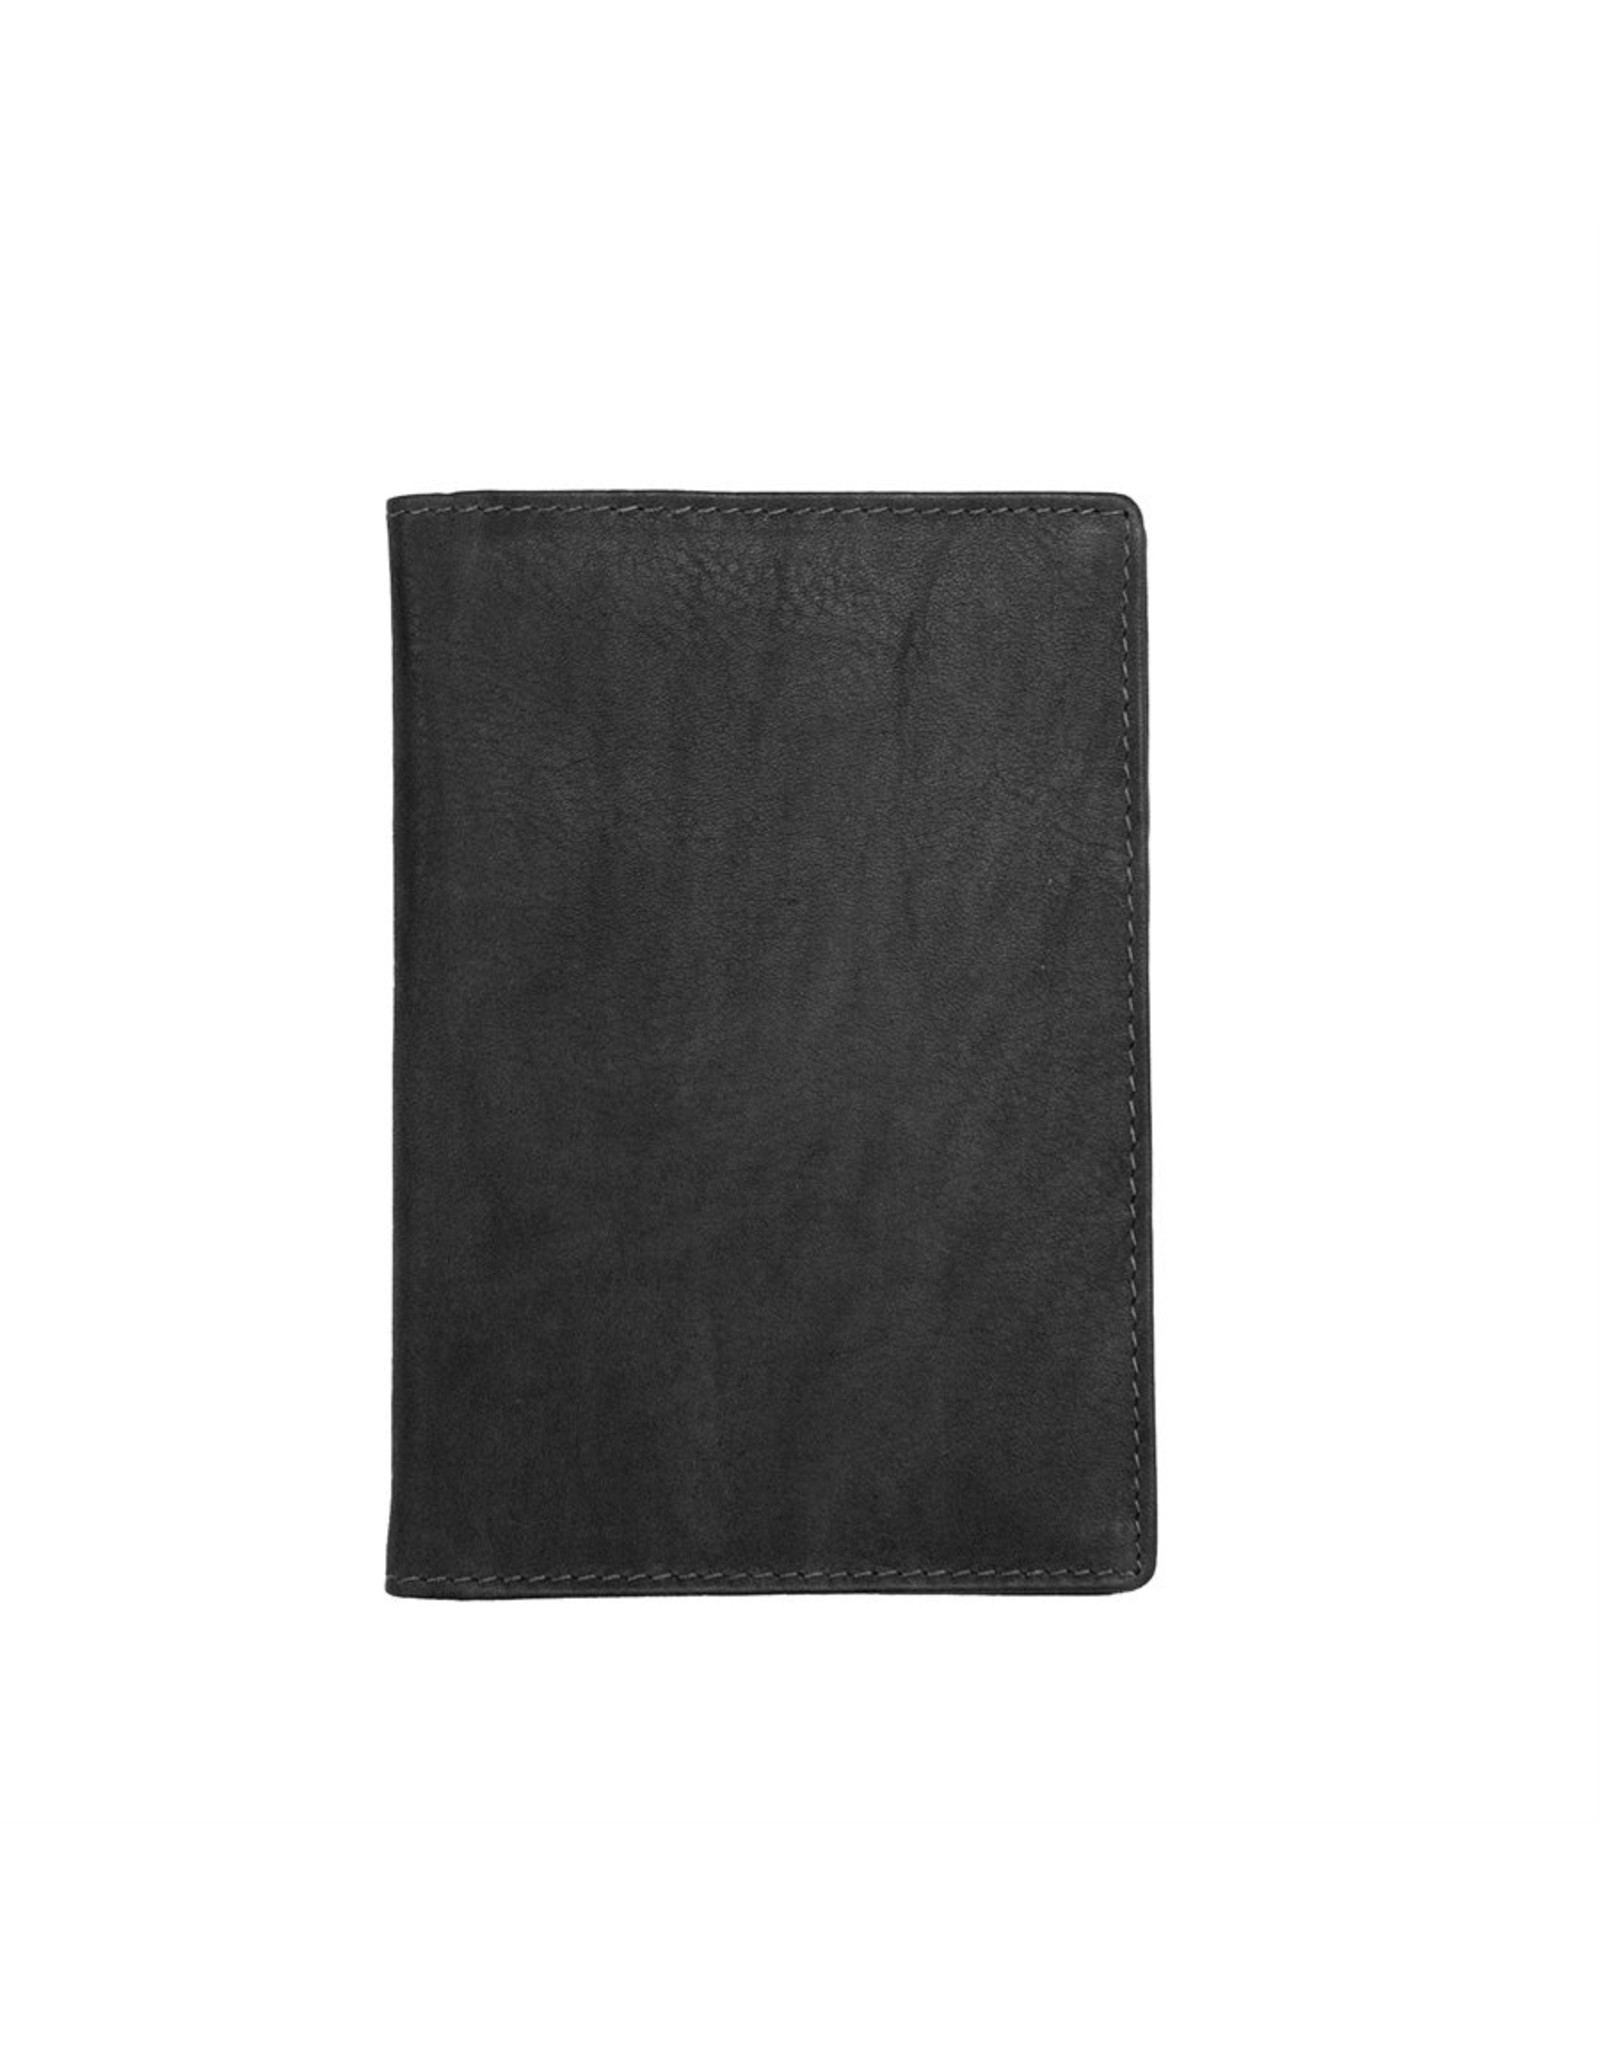 Leather Handbags and Accessories 6753 Passport Case Black